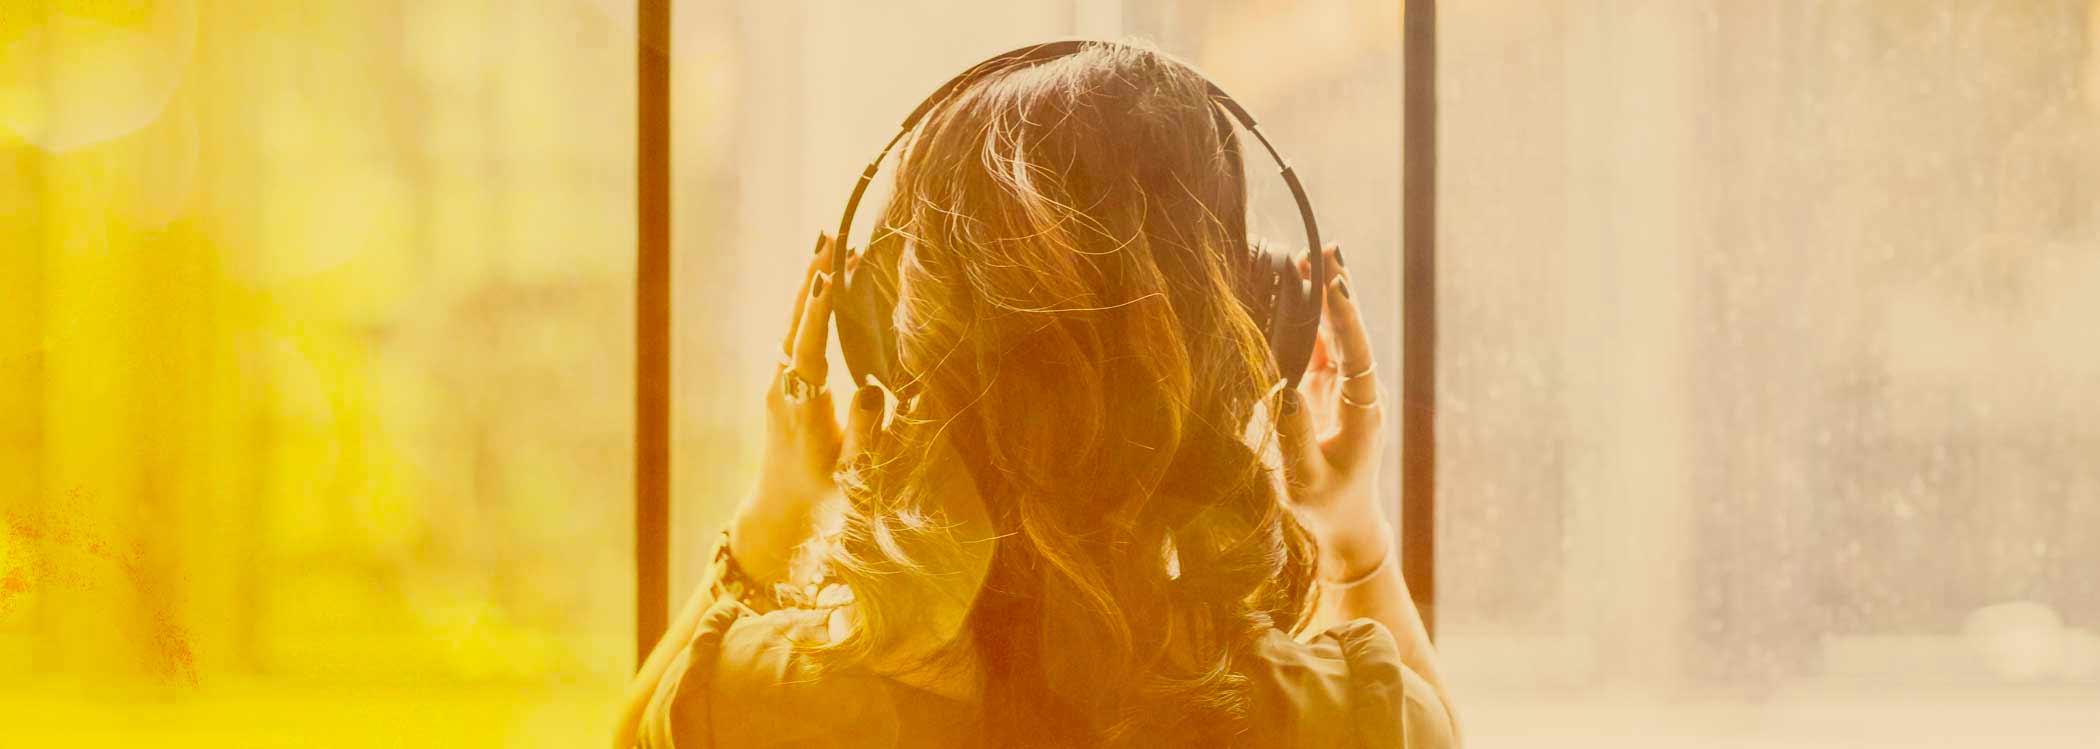 woman headphones dare to shine free course